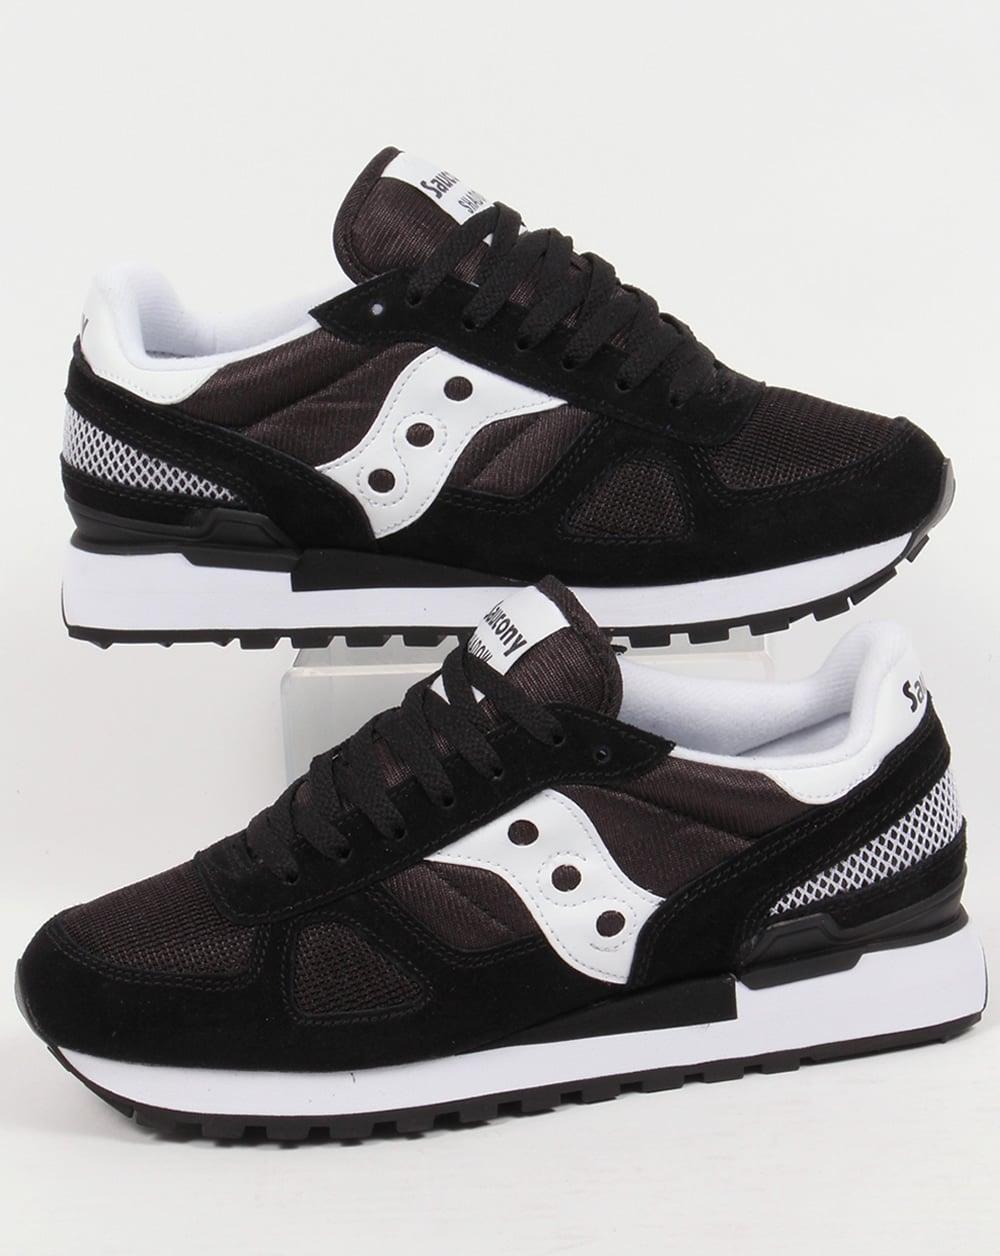 c18679176571 Saucony Saucony Shadow Original Trainers Black